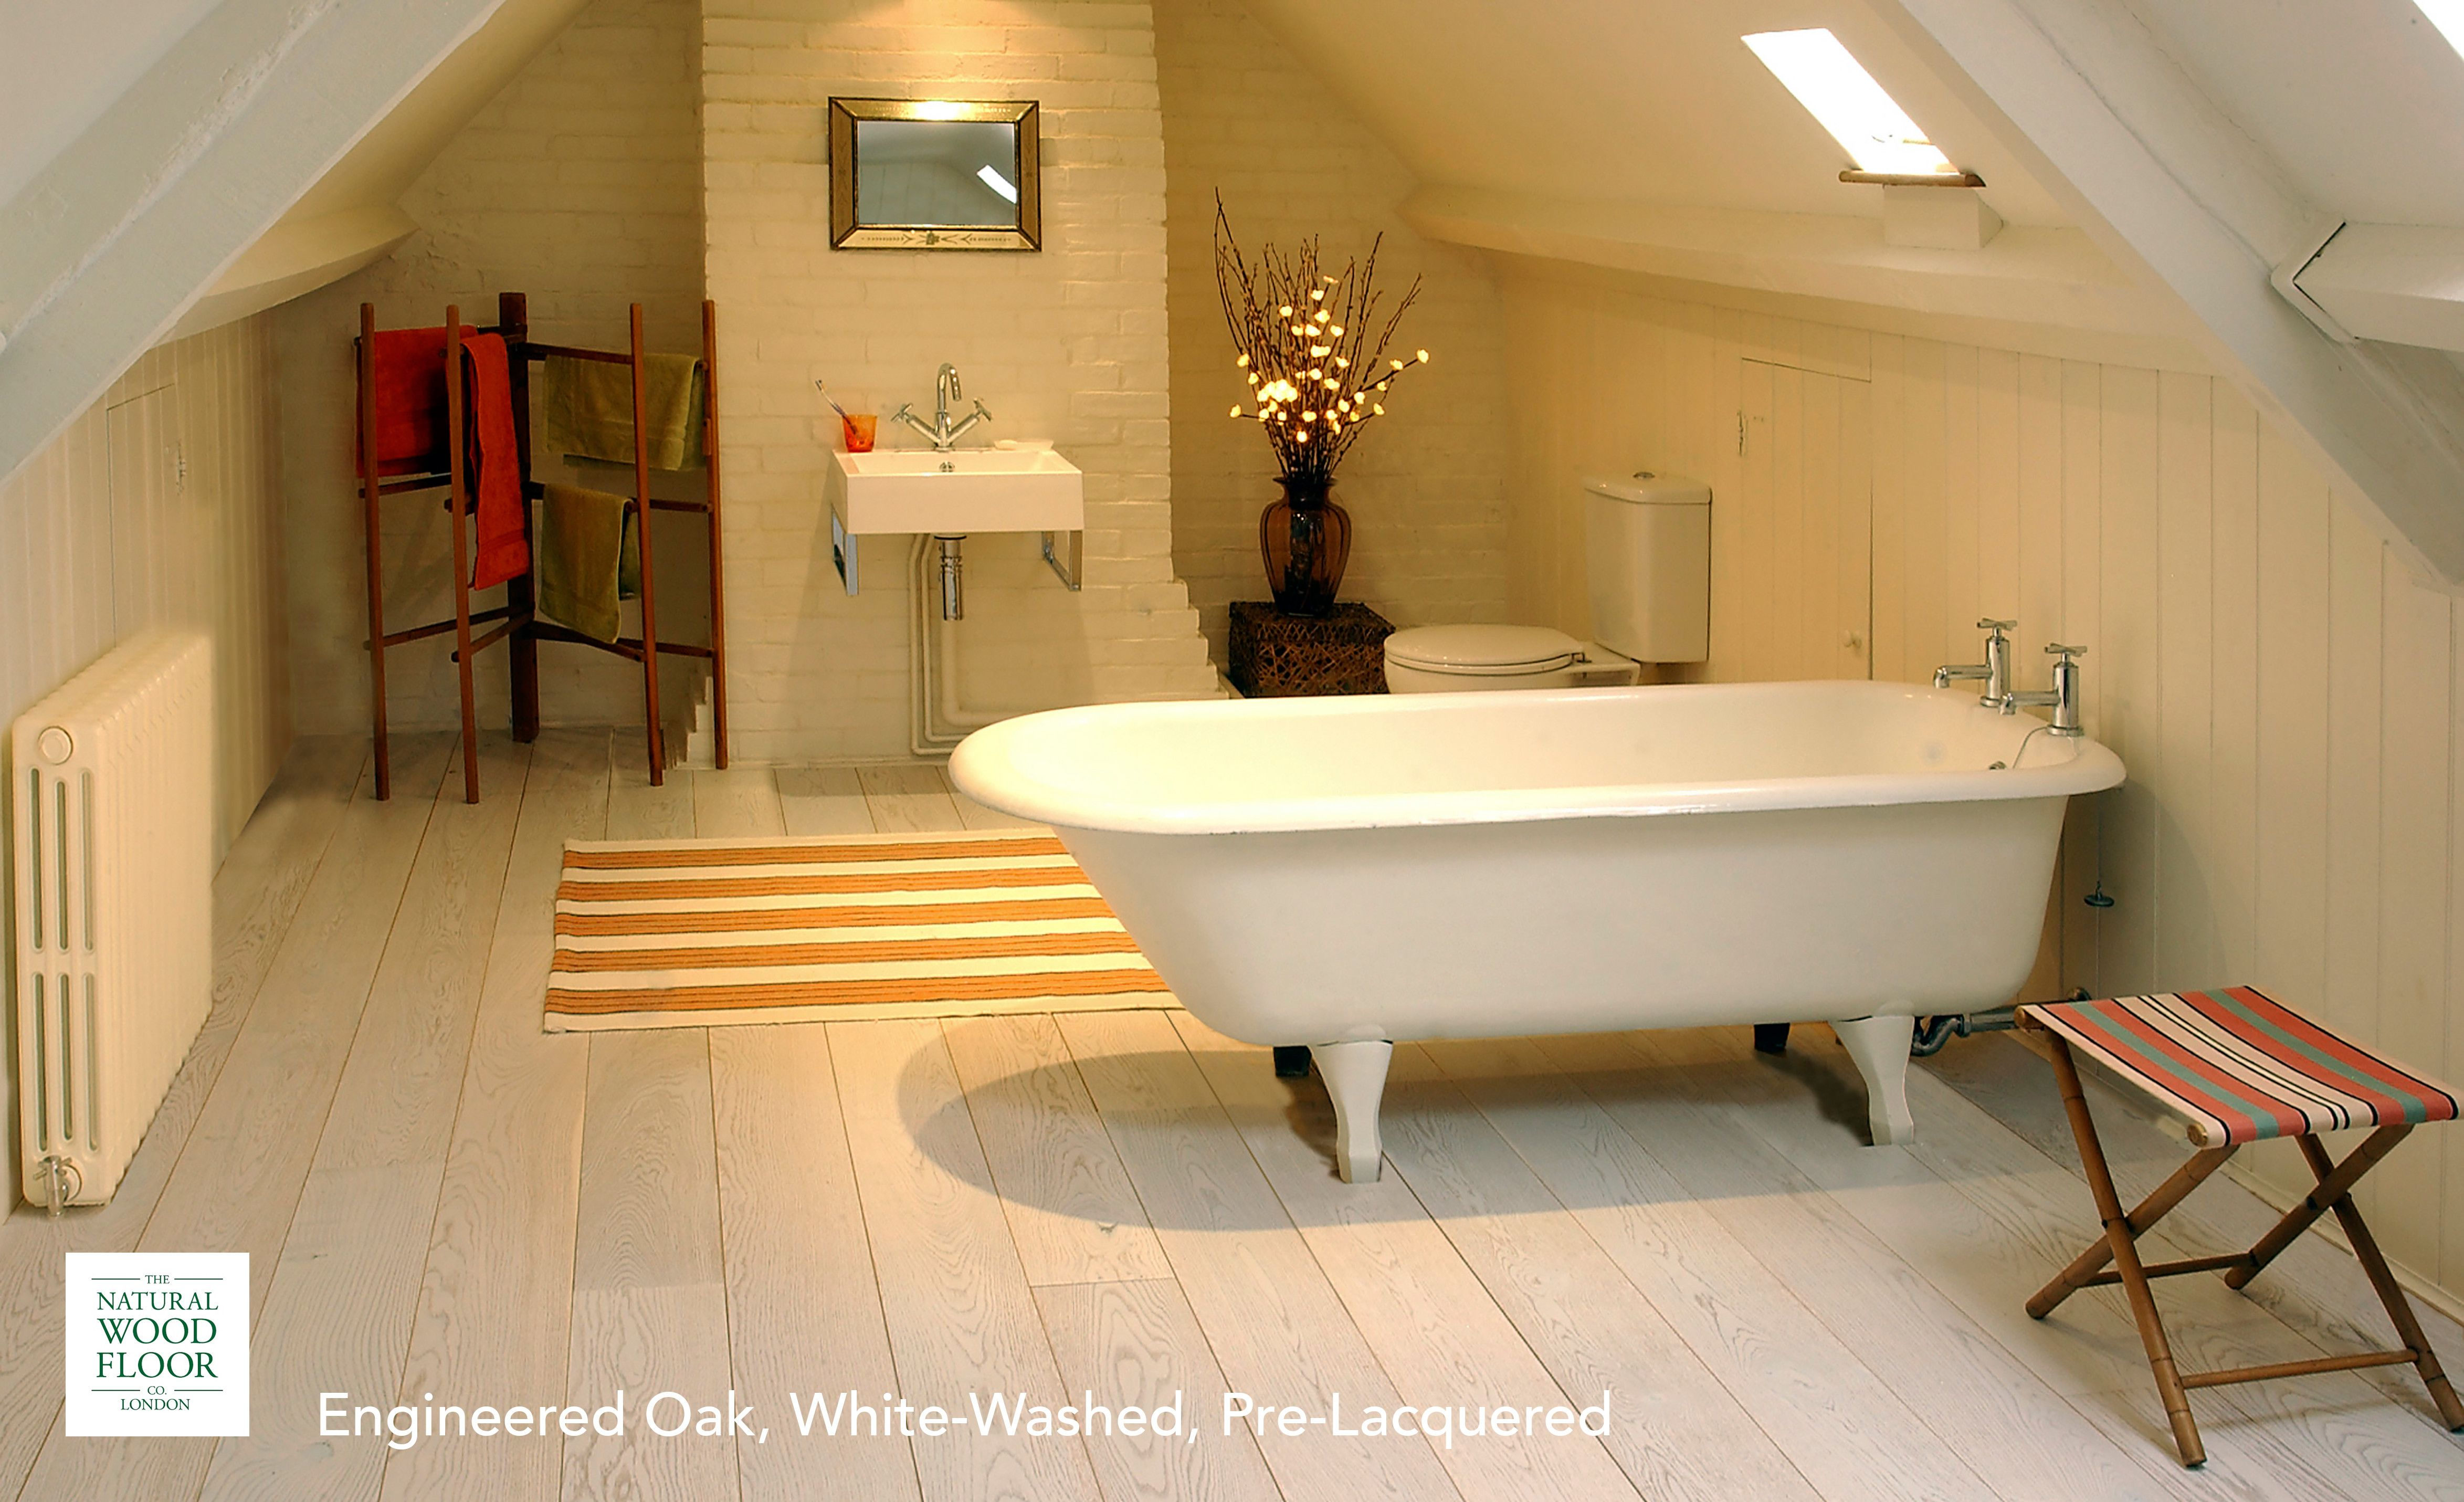 The Natural Wood Floor Company S Engineered Oak White Board Is Perfect For A Bathroom Salle De Bain En Bambou Sol Vinyle Salle De Bains Sol En Bambou